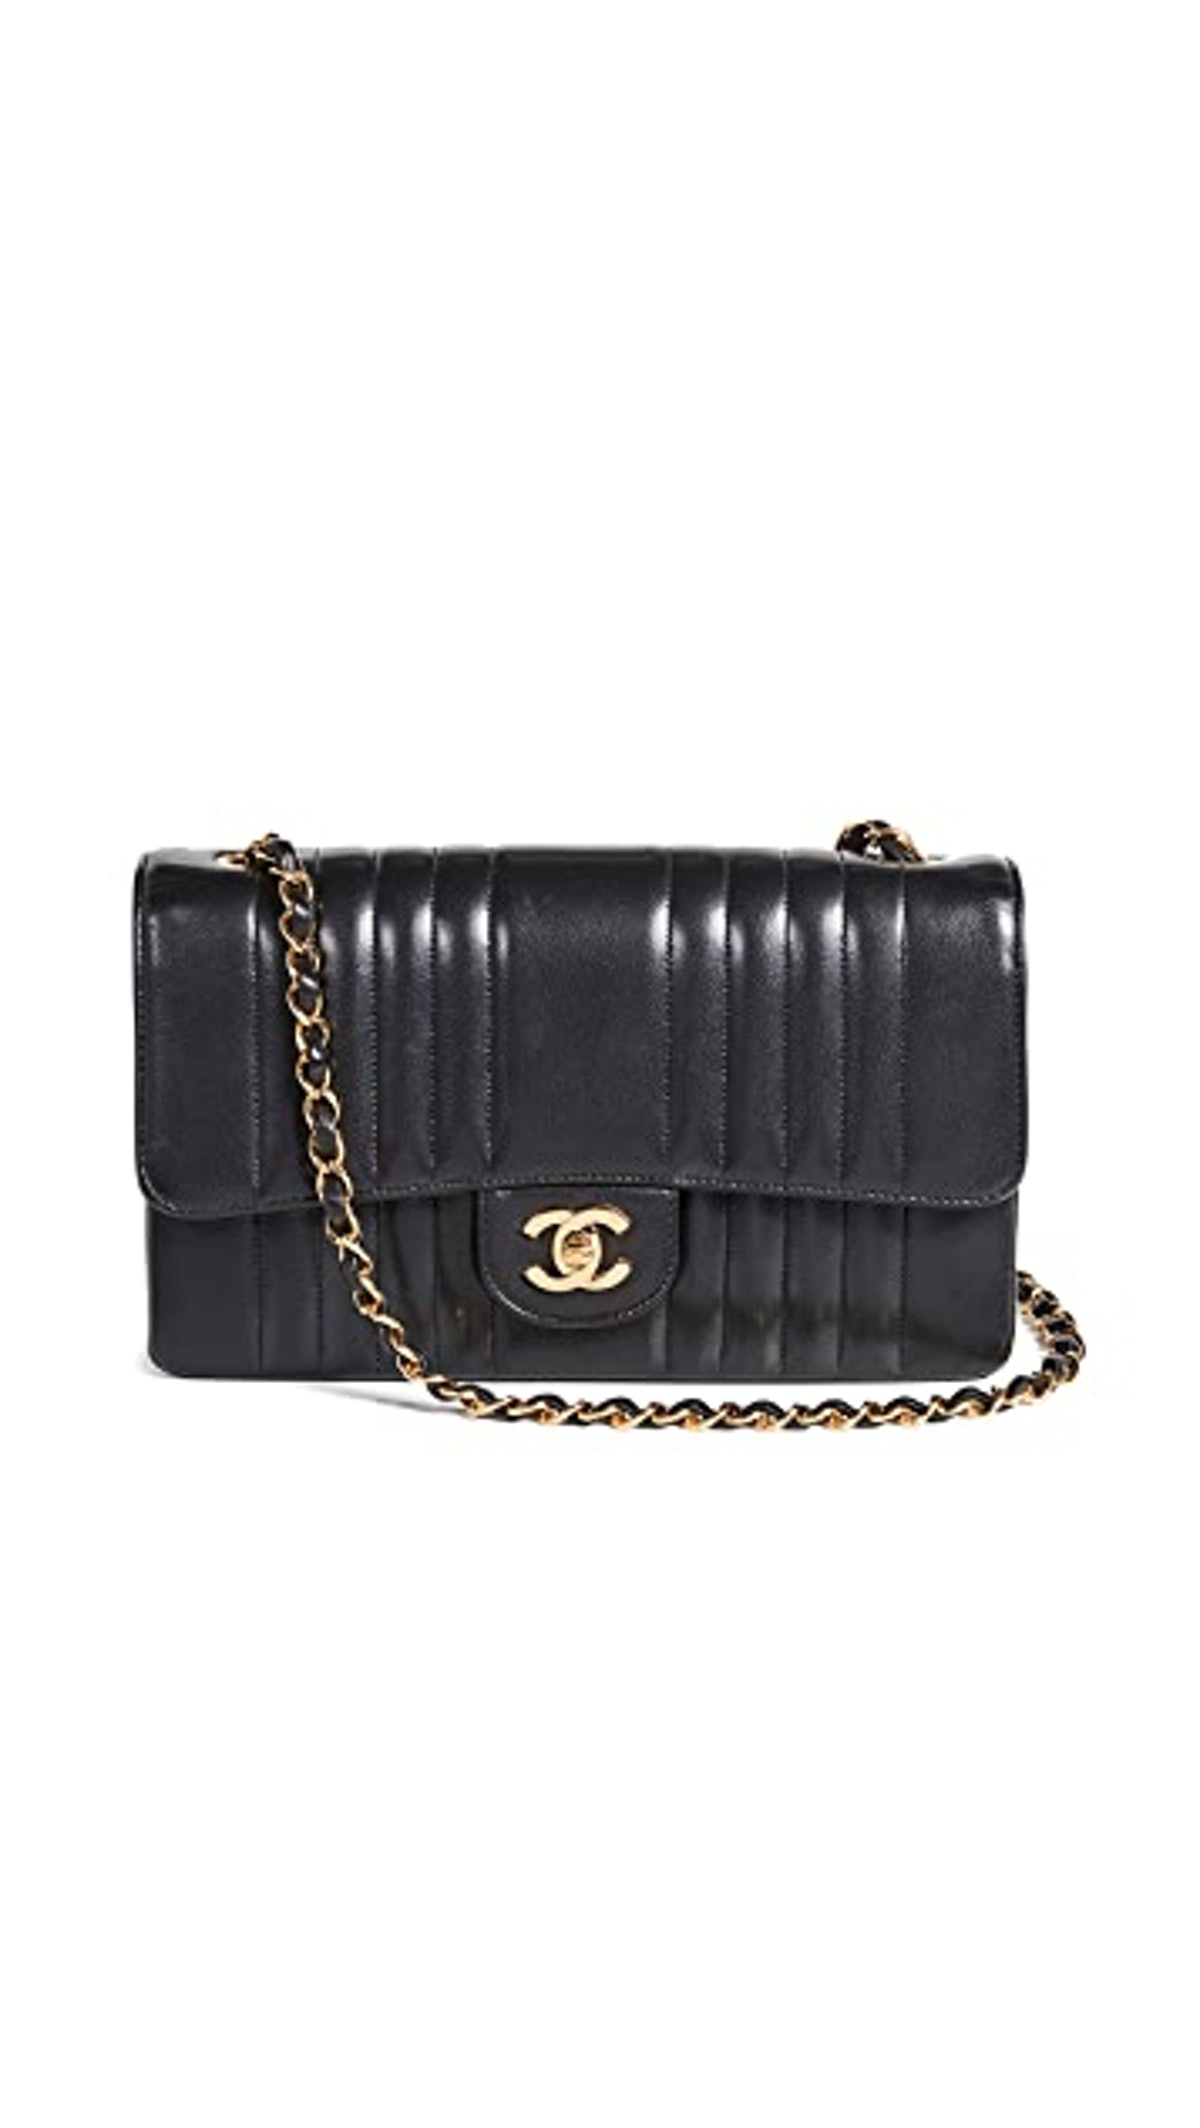 "Chanel Vertical 10"" Flap Bag"